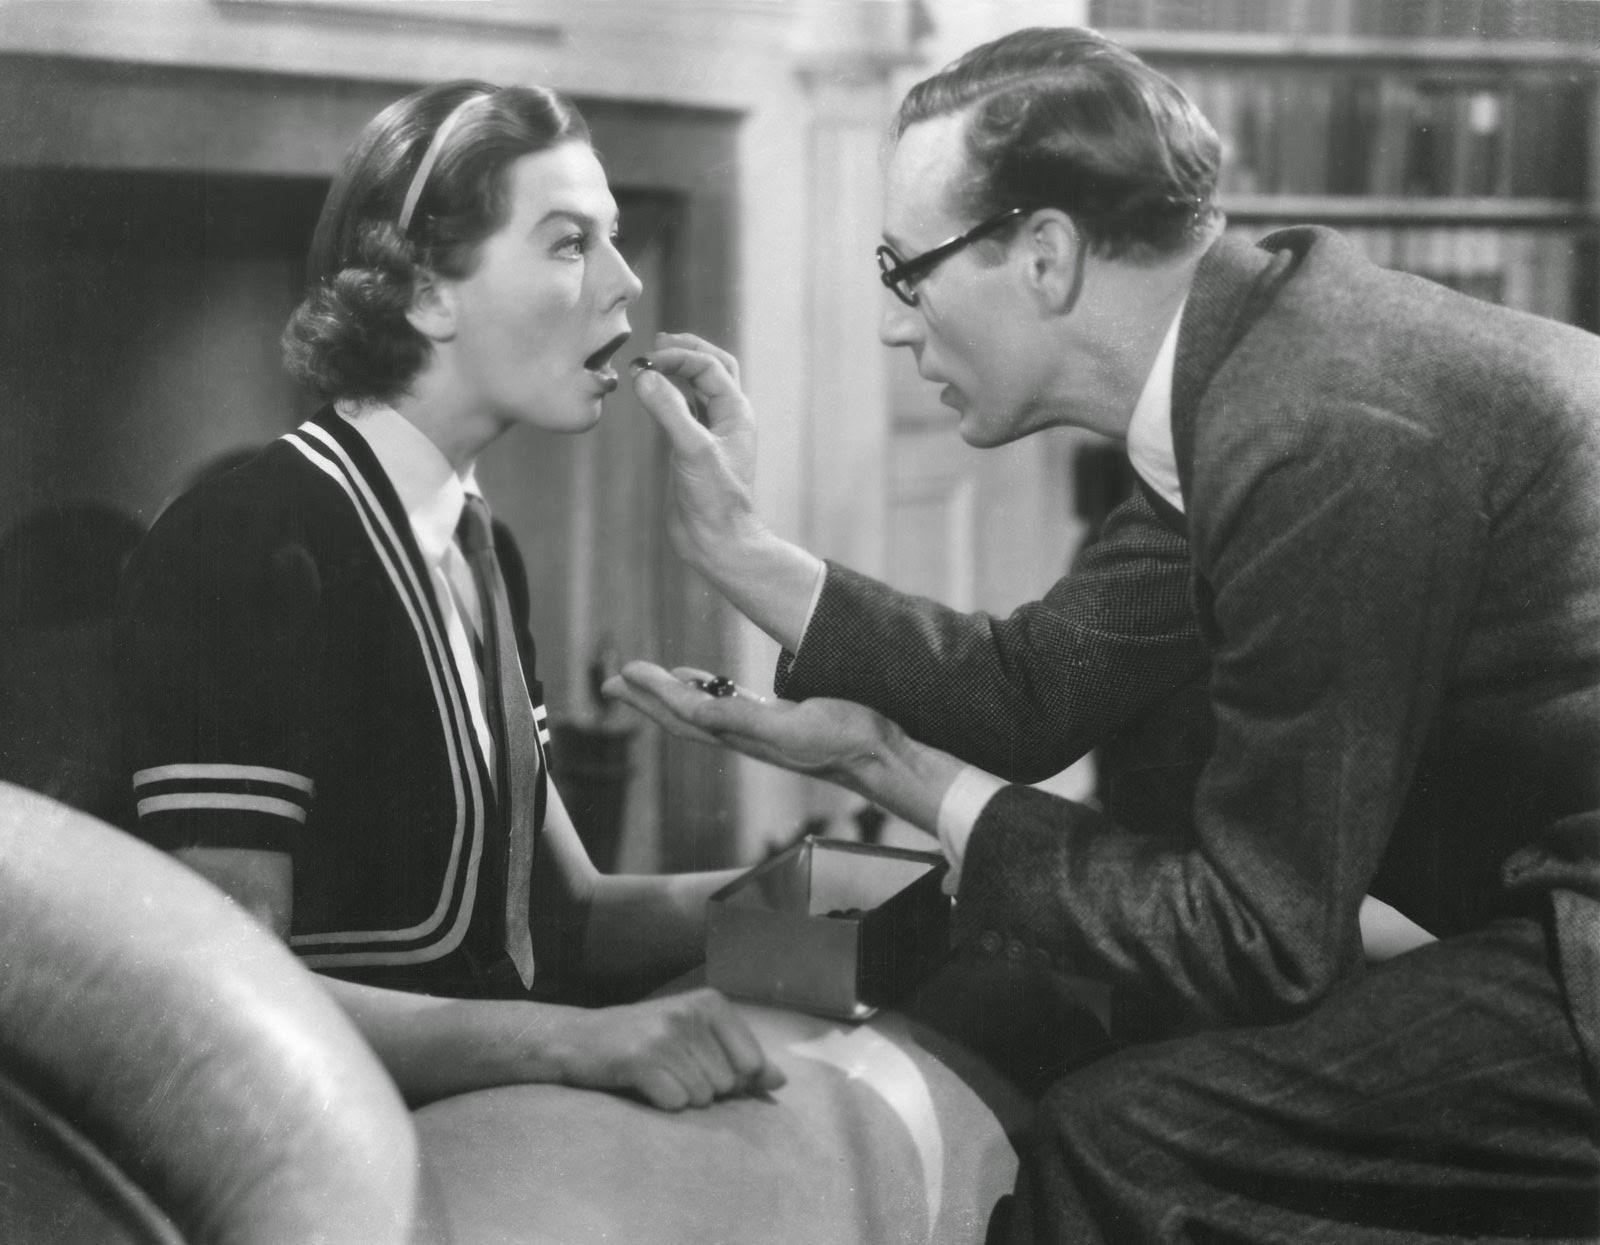 java s journey fabulous 1930s films blogathon pyg on 1938